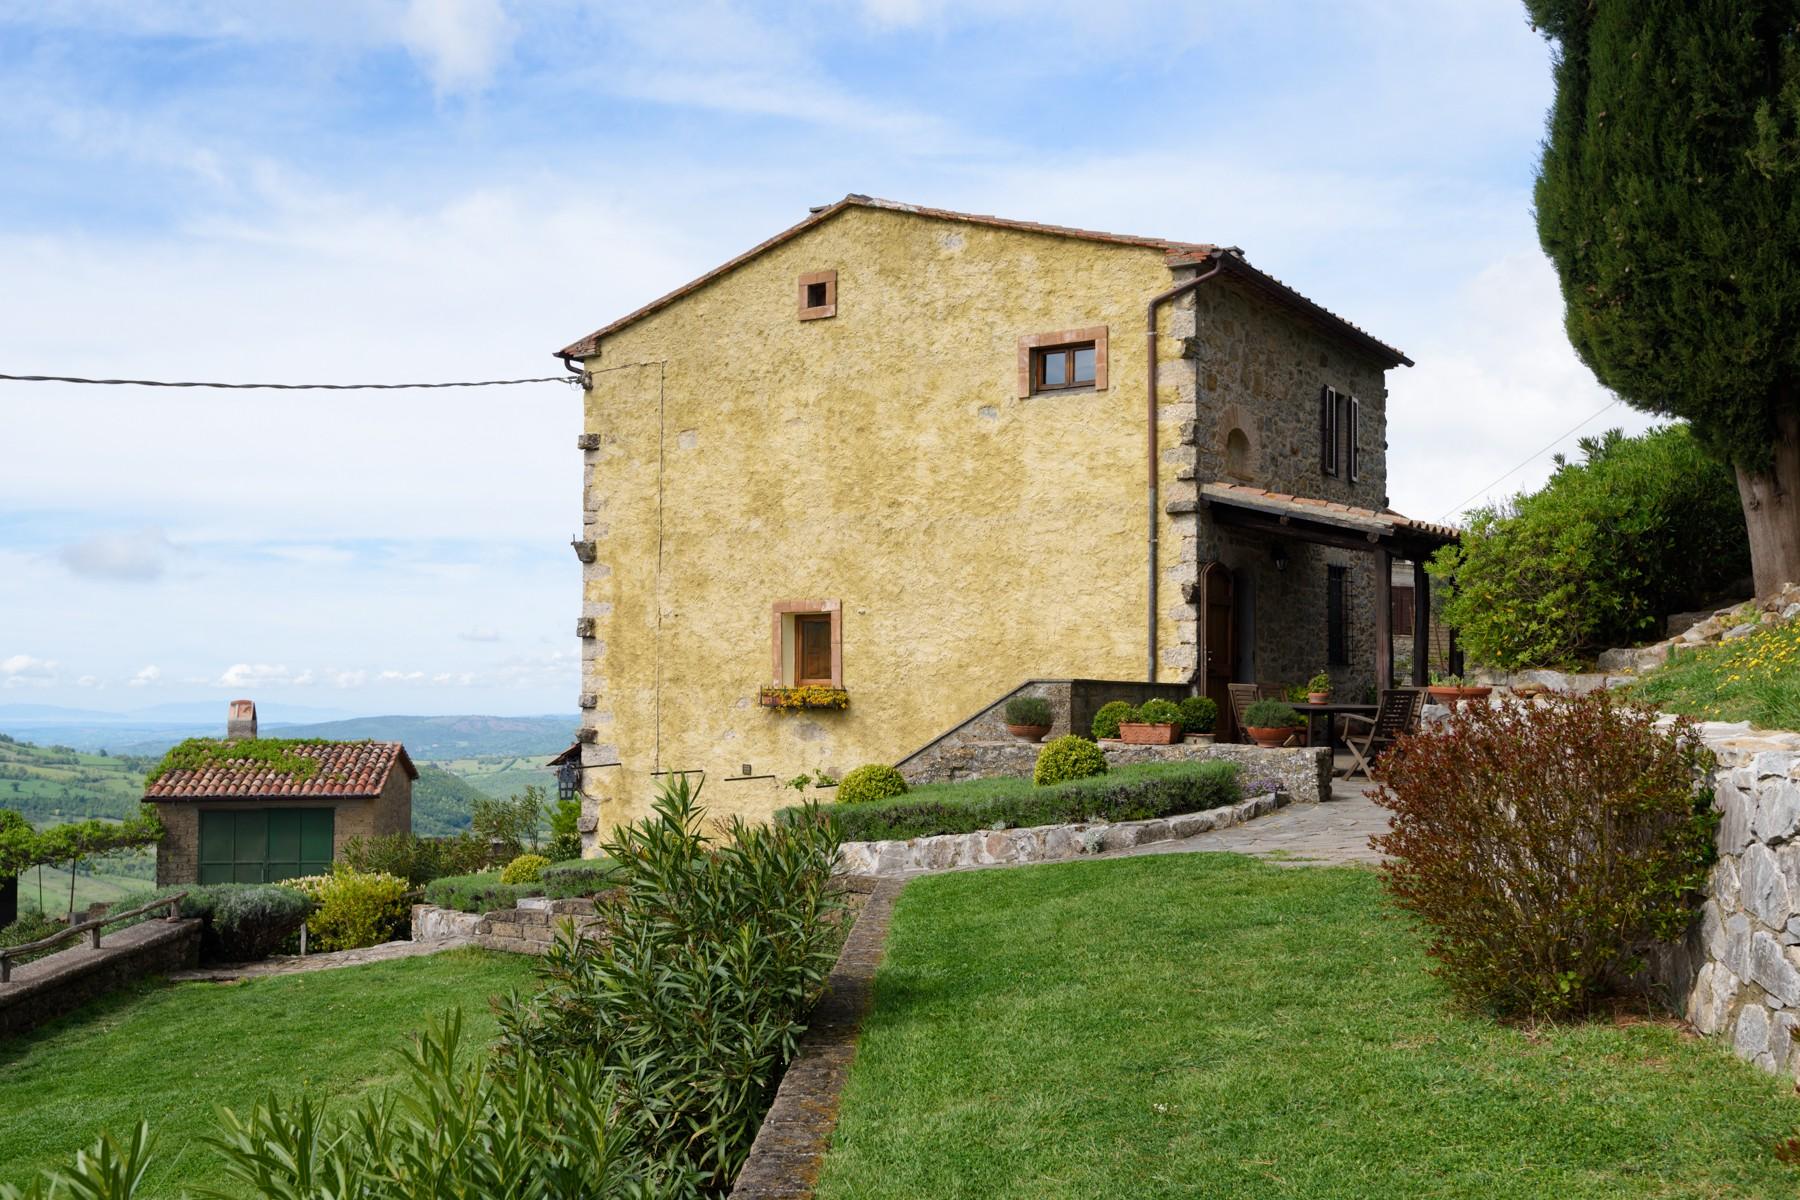 Casa indipendente in Vendita a Semproniano: 4 locali, 220 mq - Foto 2